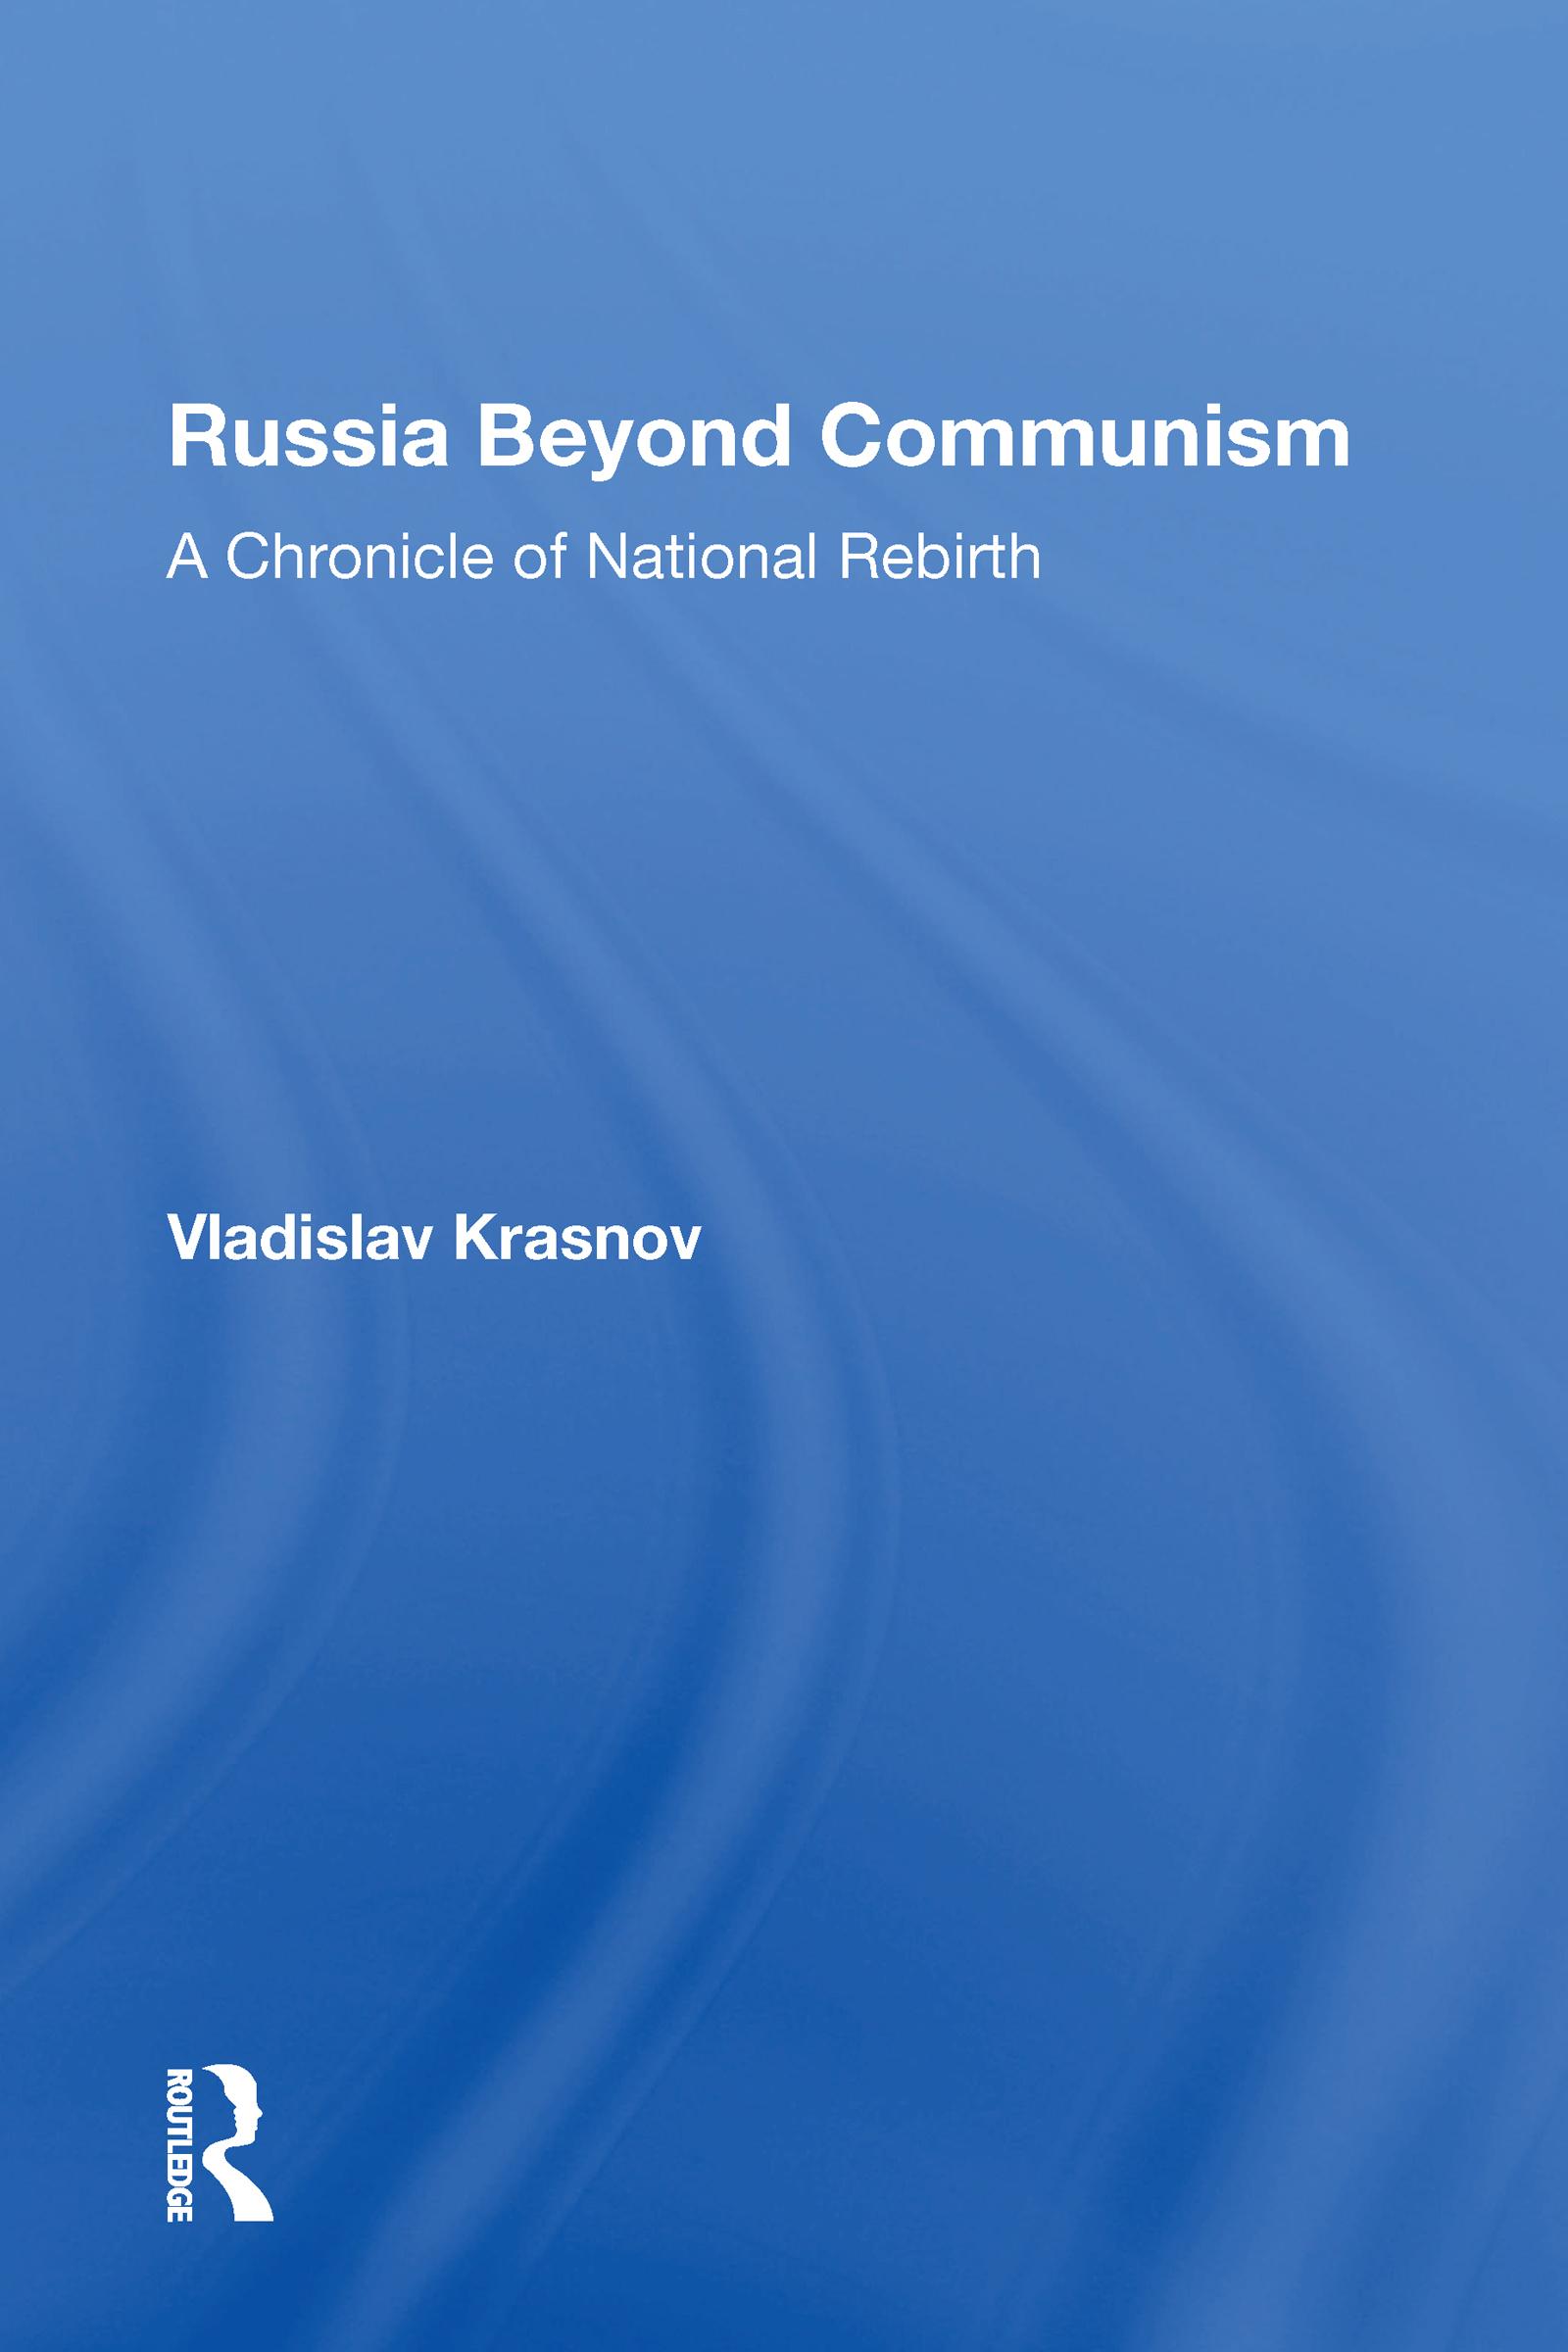 Russia Beyond Communism